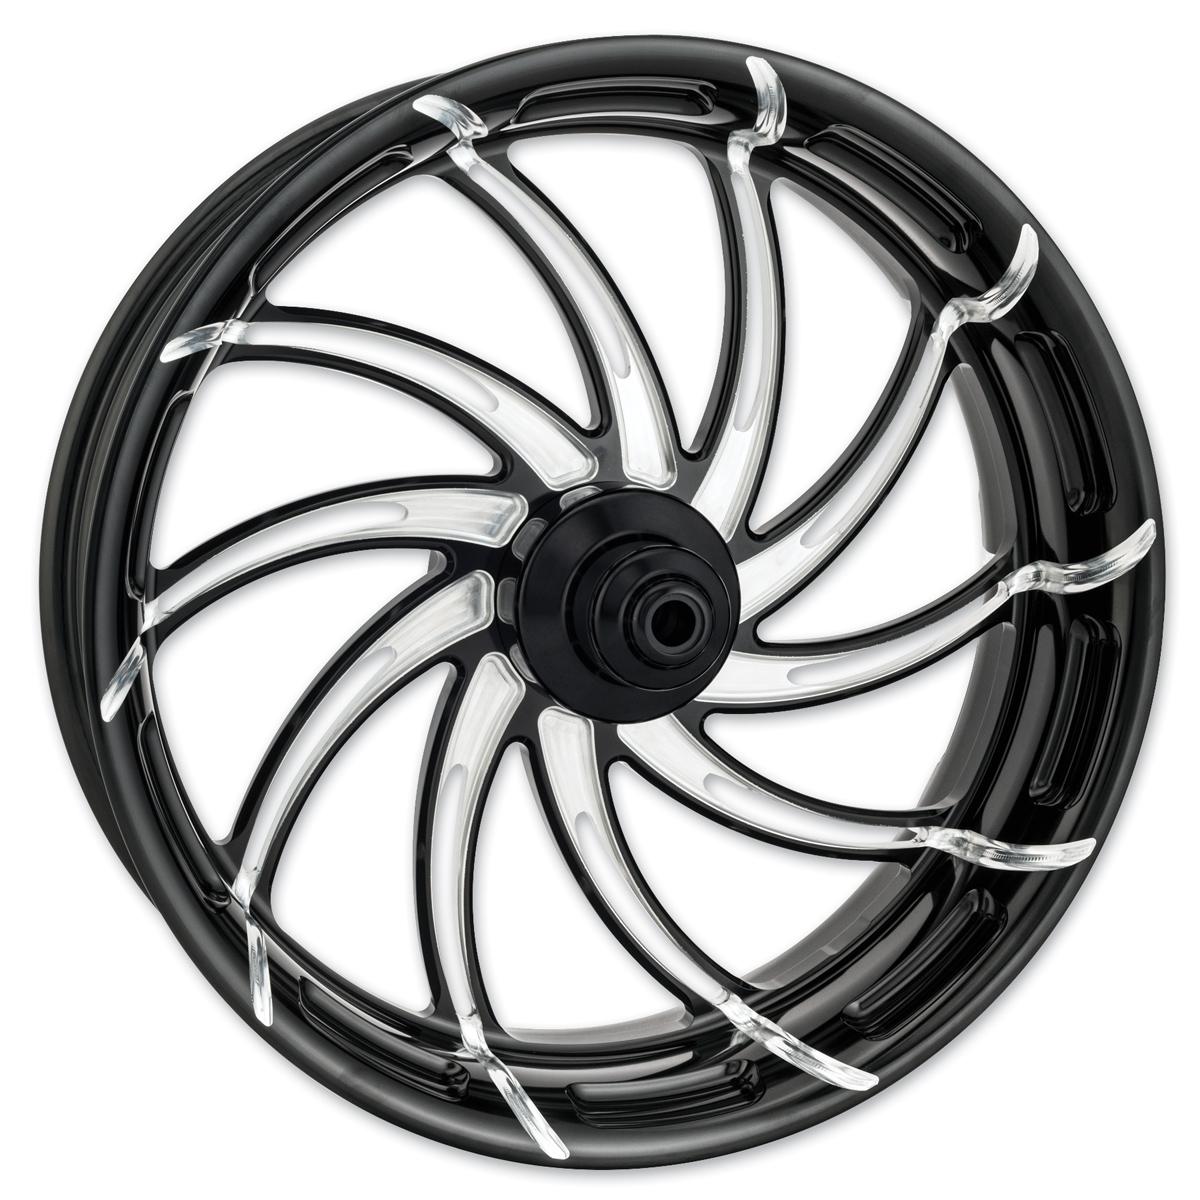 Performance Machine Supra Platinum Cut Front Wheel 21x3.5 Non-ABS